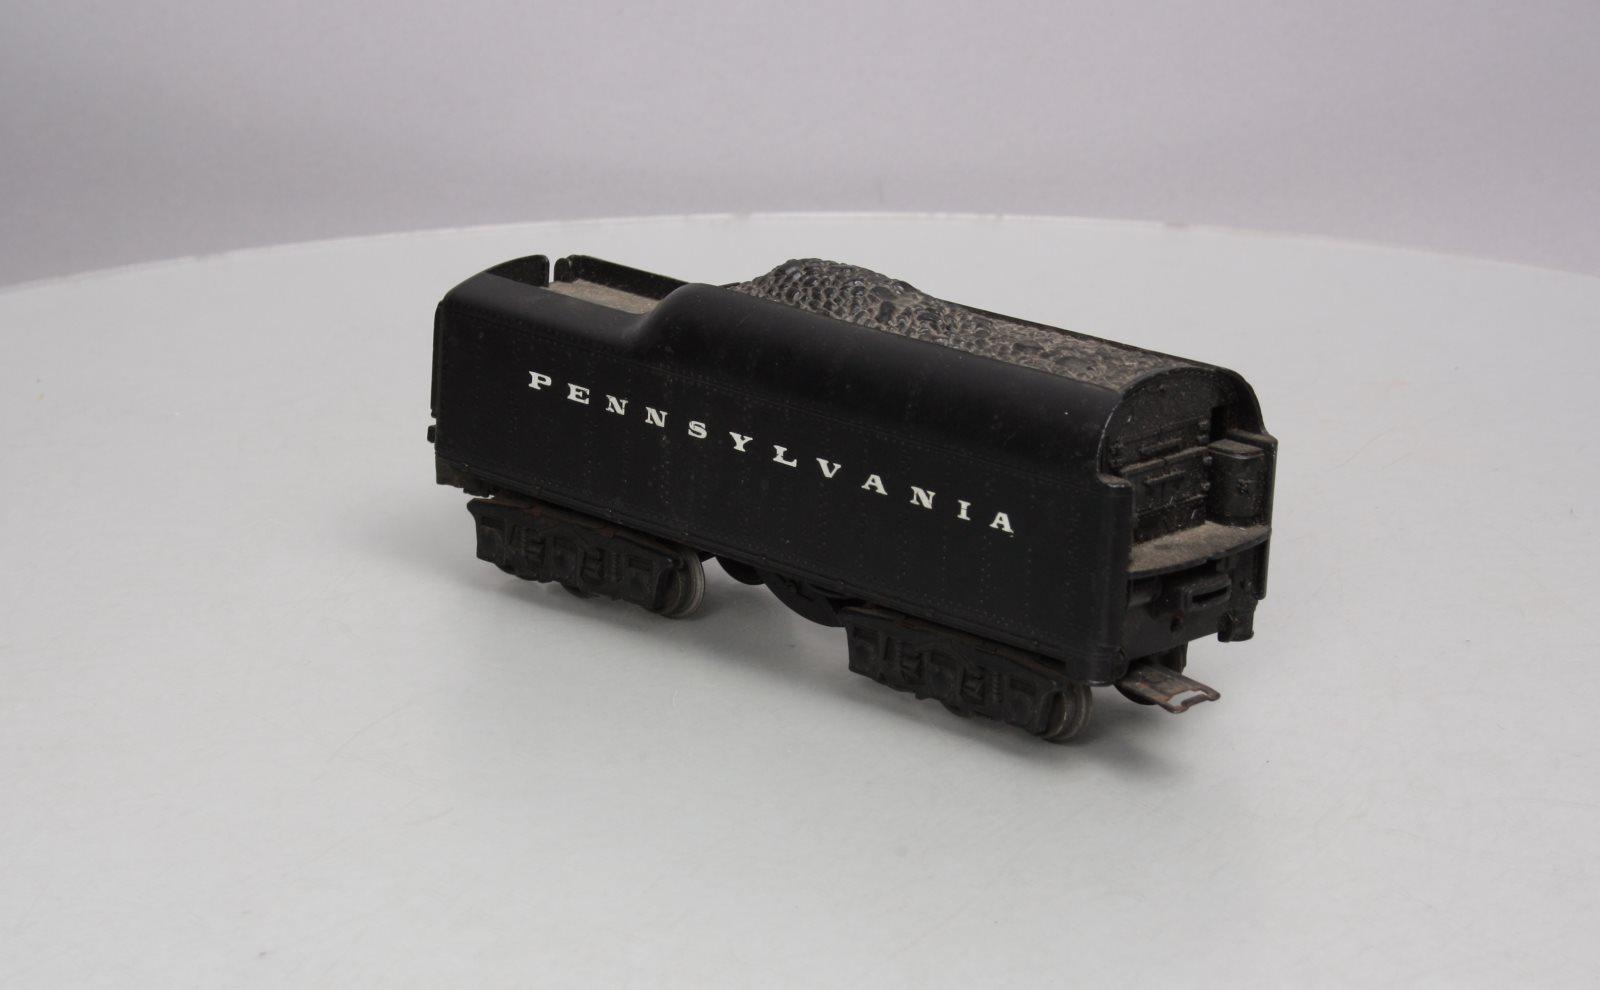 Lionel Trains Post War Tender Wiring Diagram Everything About Locomotive Whistle Diagrams Library Rh 9 Mac Happen De E Unit